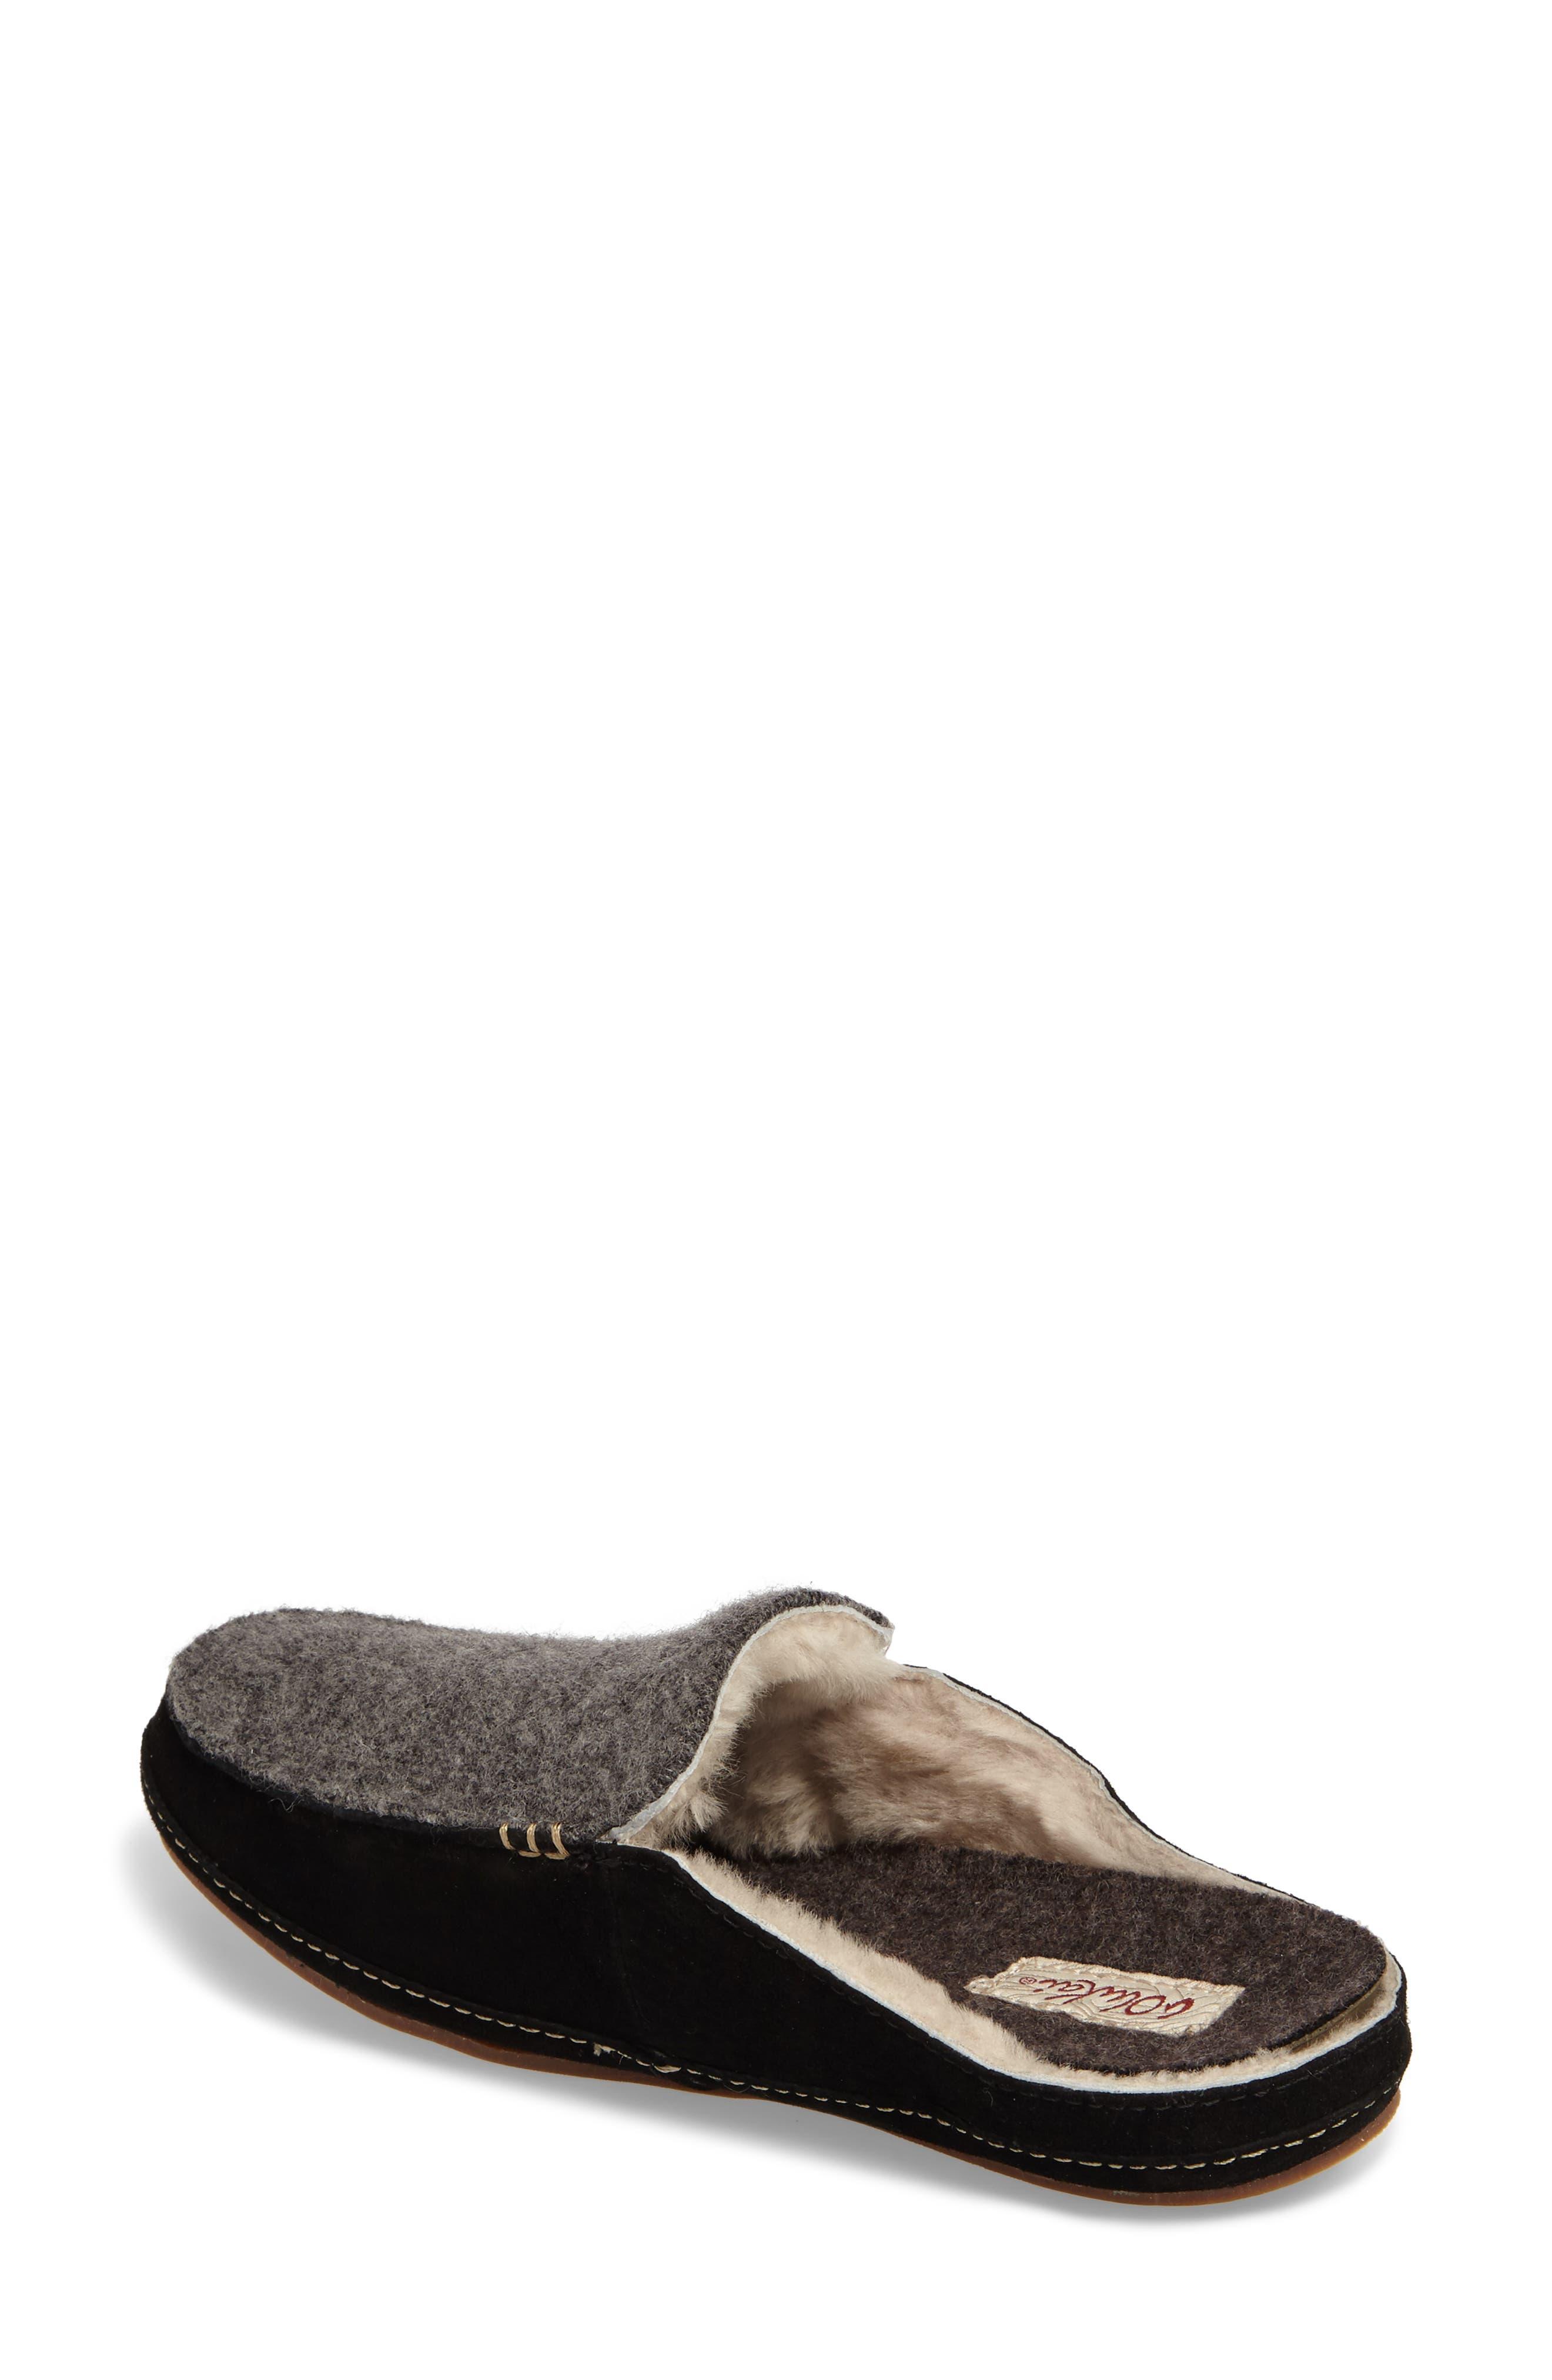 Alaula Genuine Shearling Lined Slipper,                             Alternate thumbnail 2, color,                             087